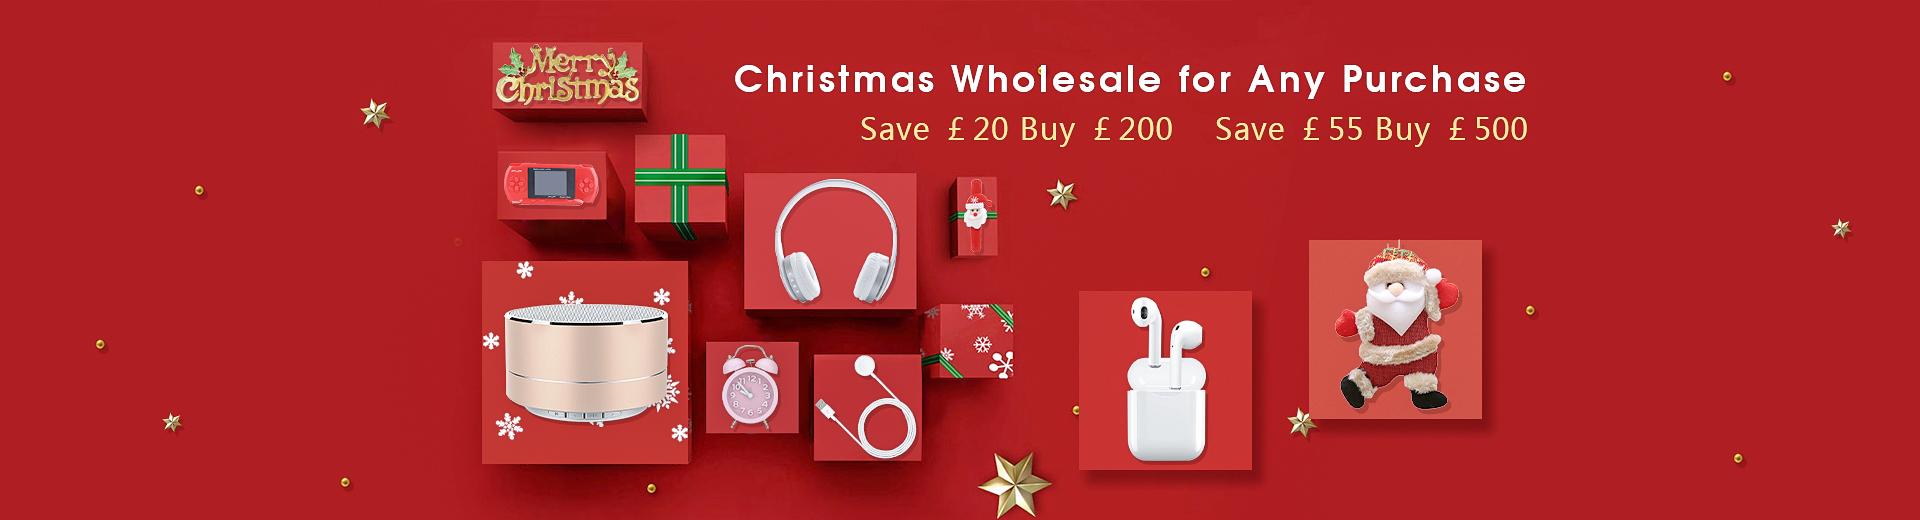 Christmas wholesale